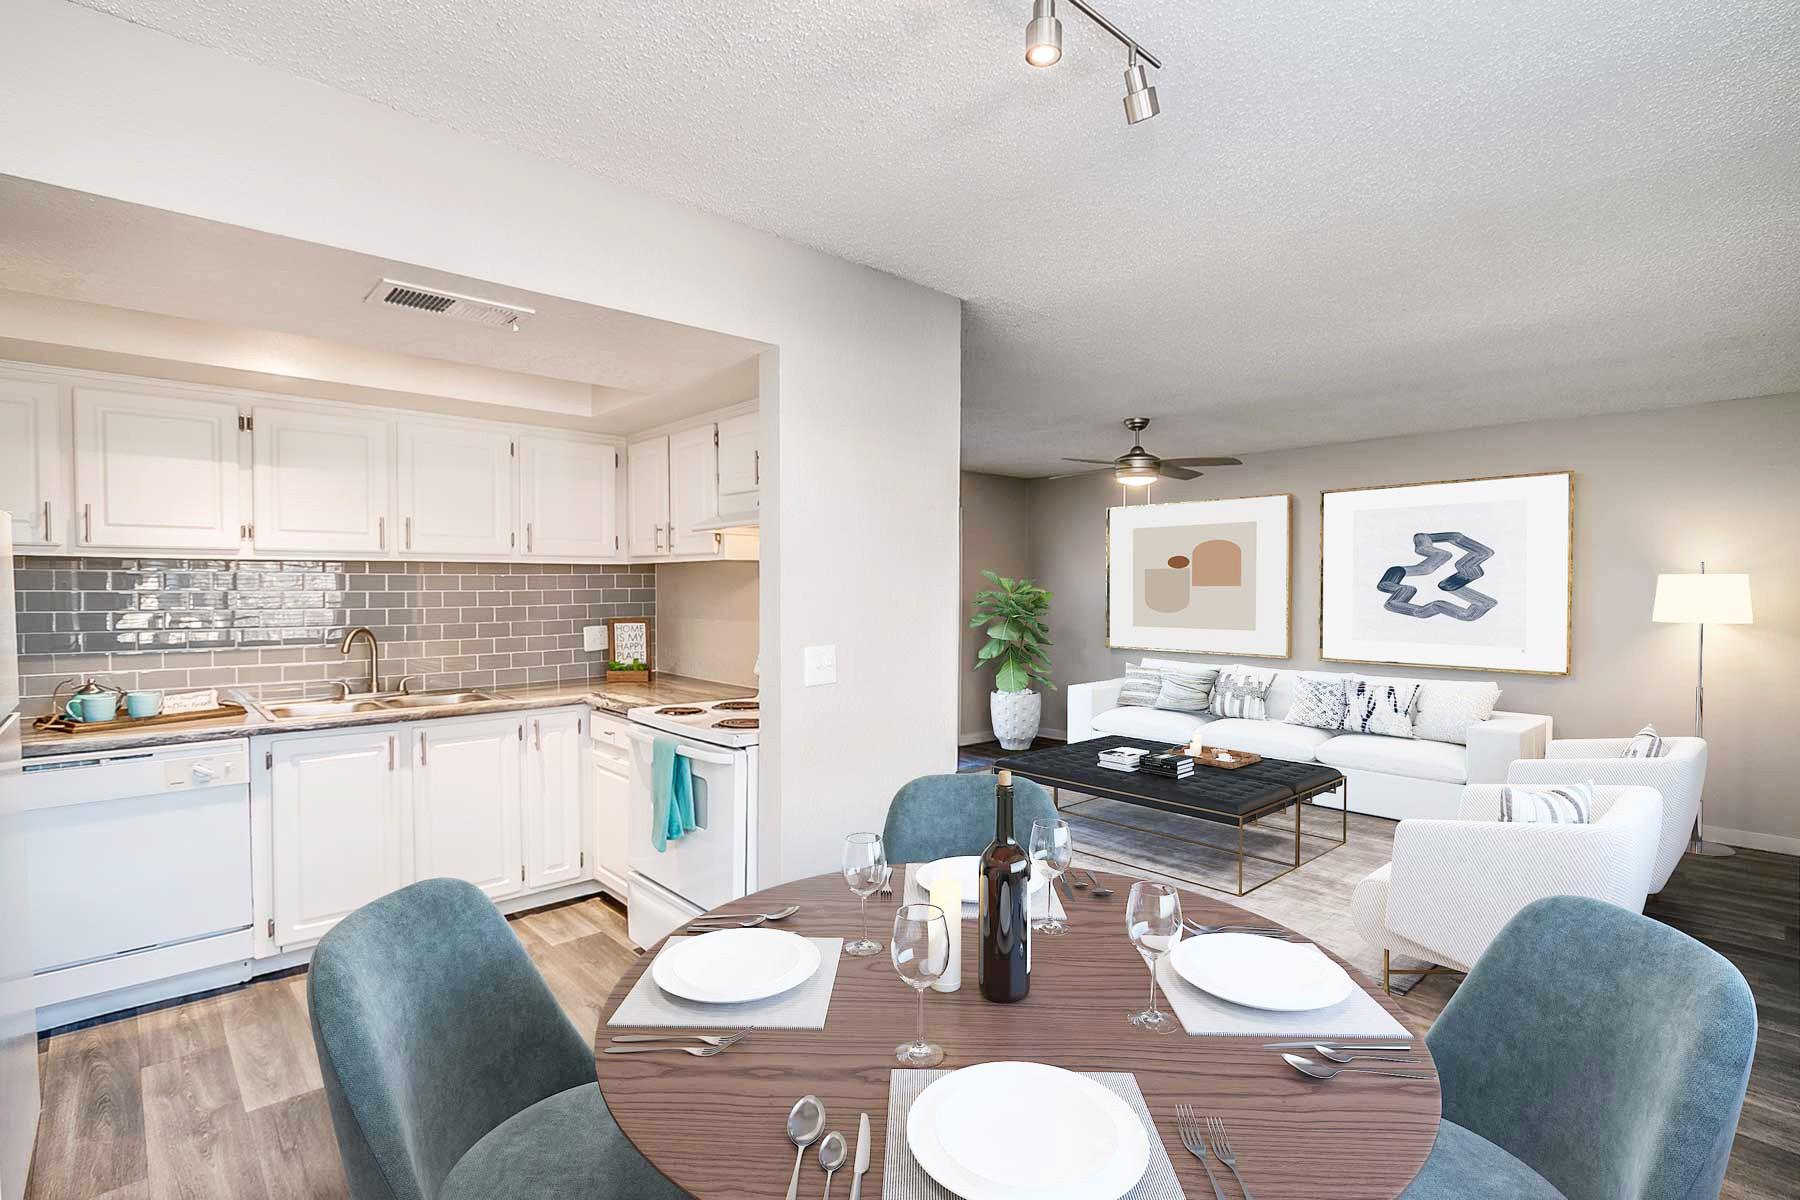 Tempe Vista Apartments for rent